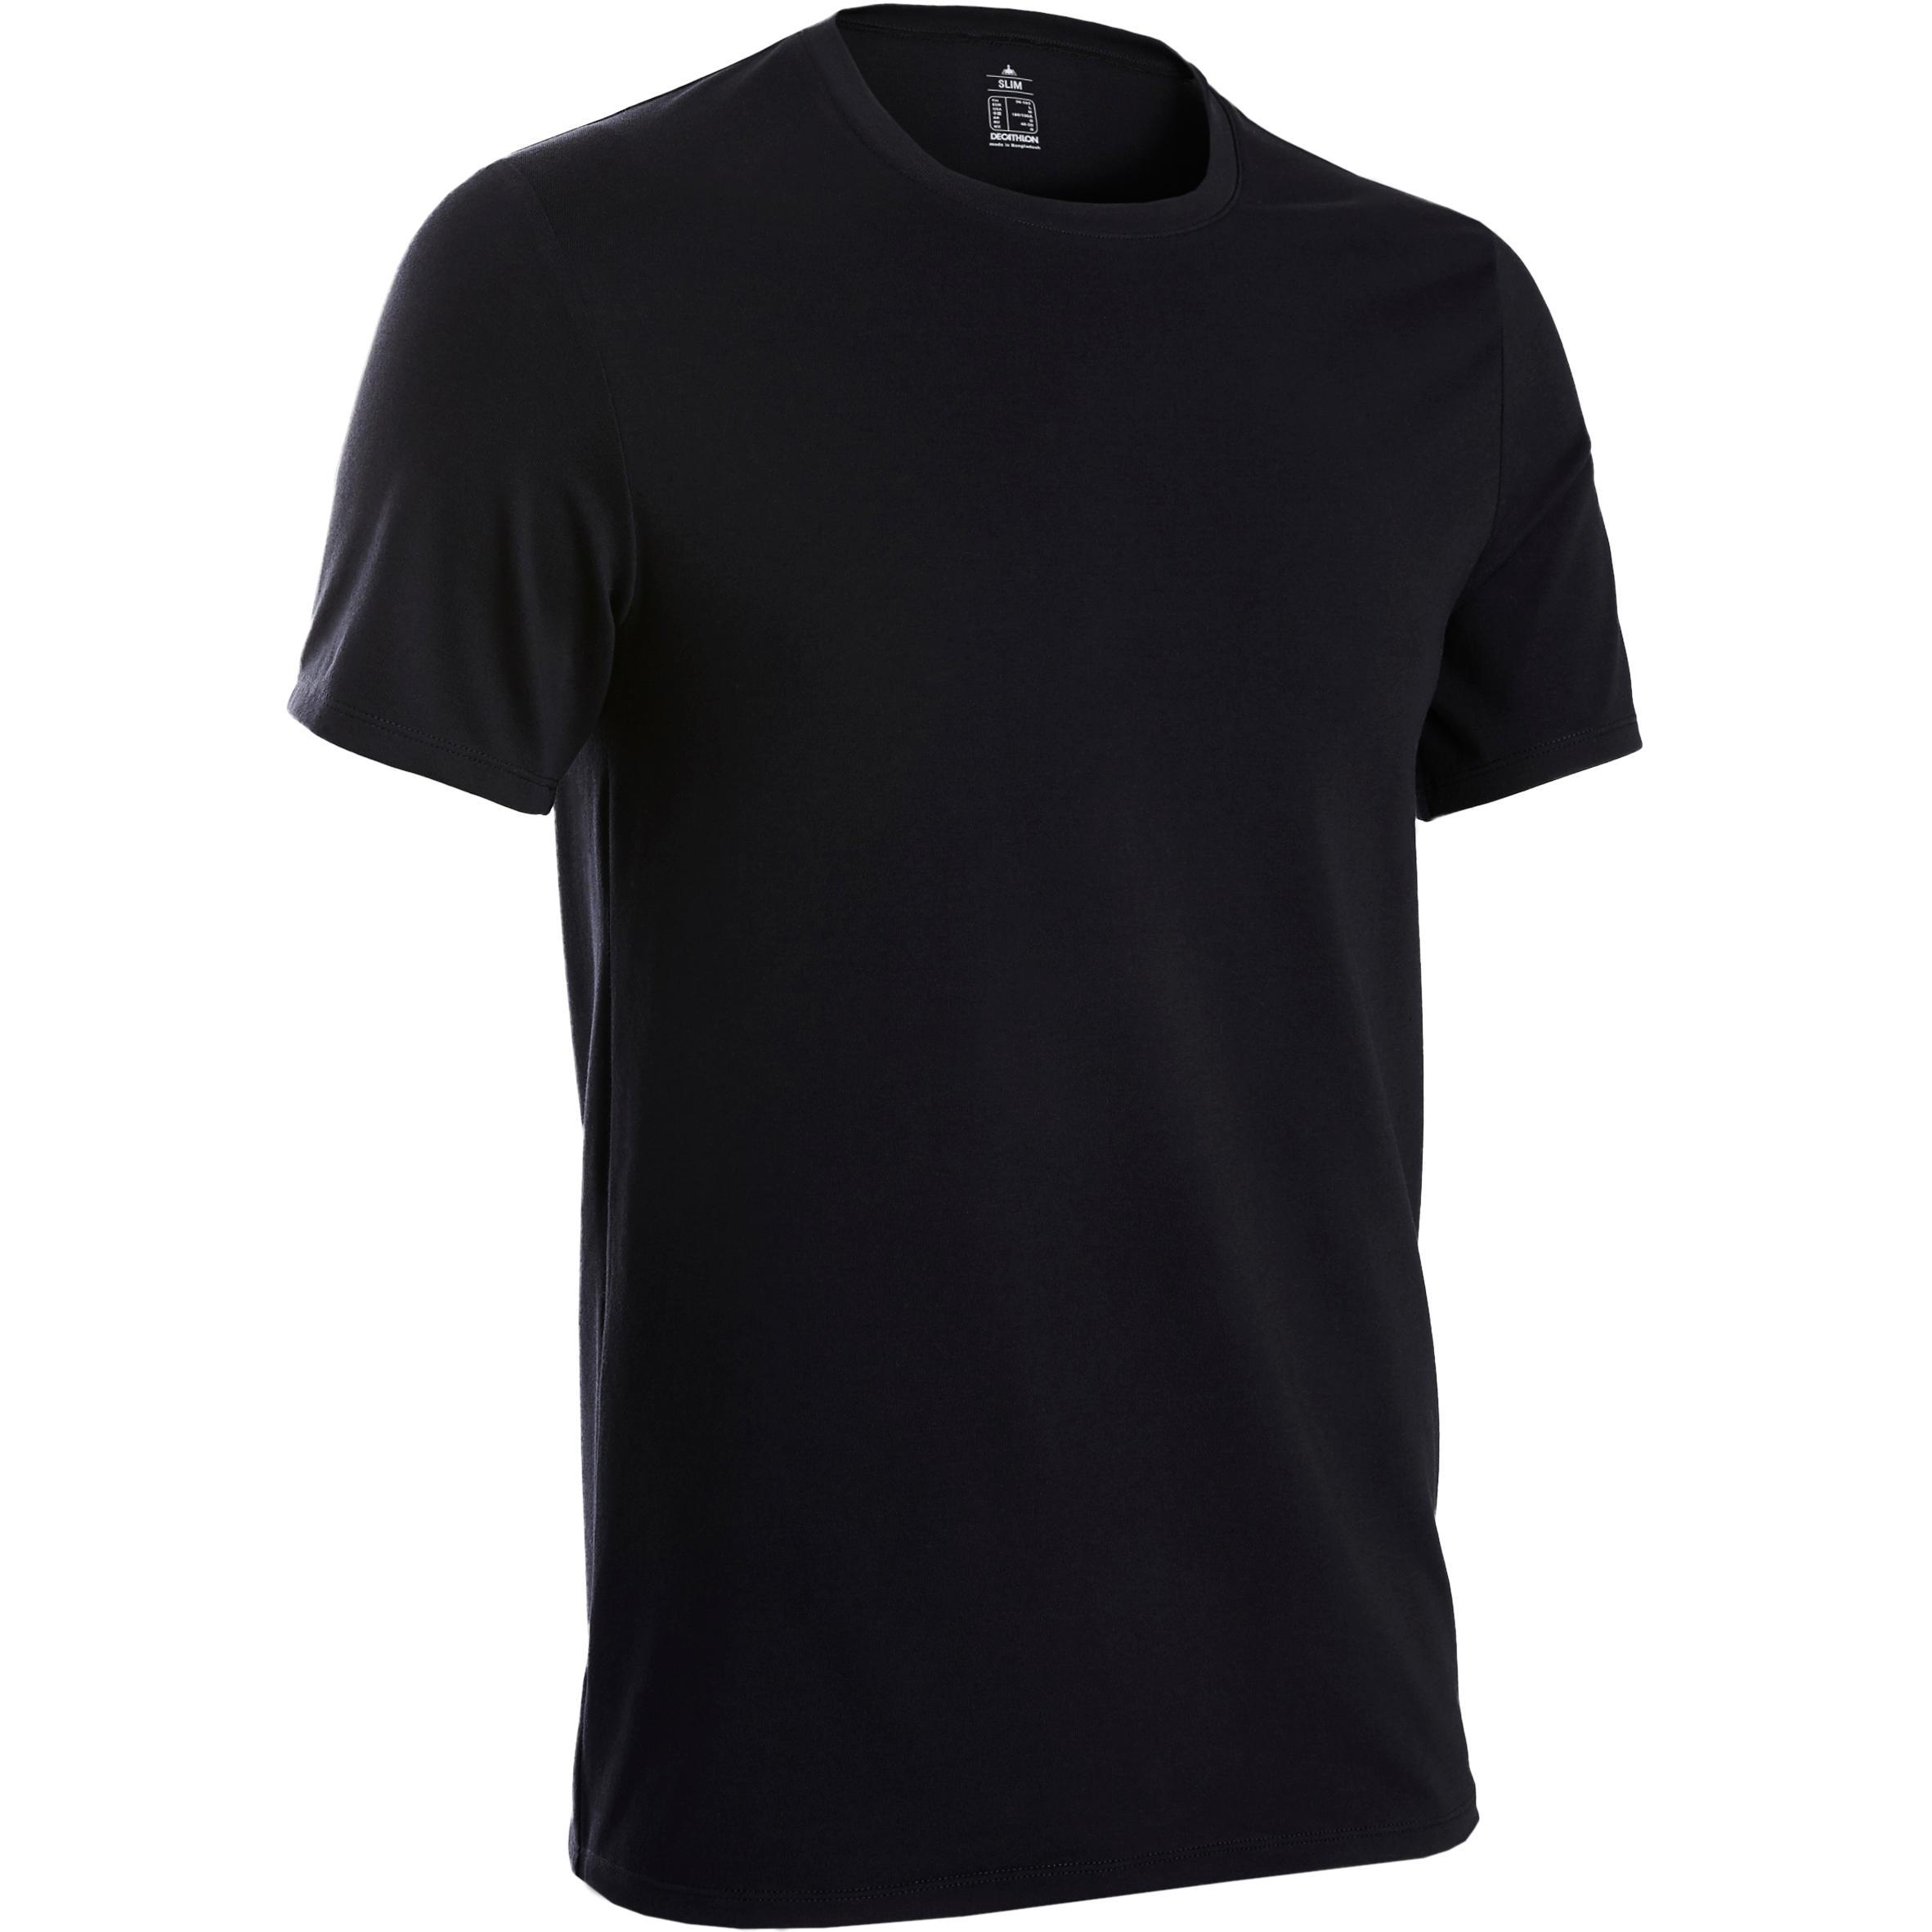 Herren Domyos T-Shirt 500 Slim Pilates sanfte Gymnastik Herren Fitness schwarz | 03608419091779